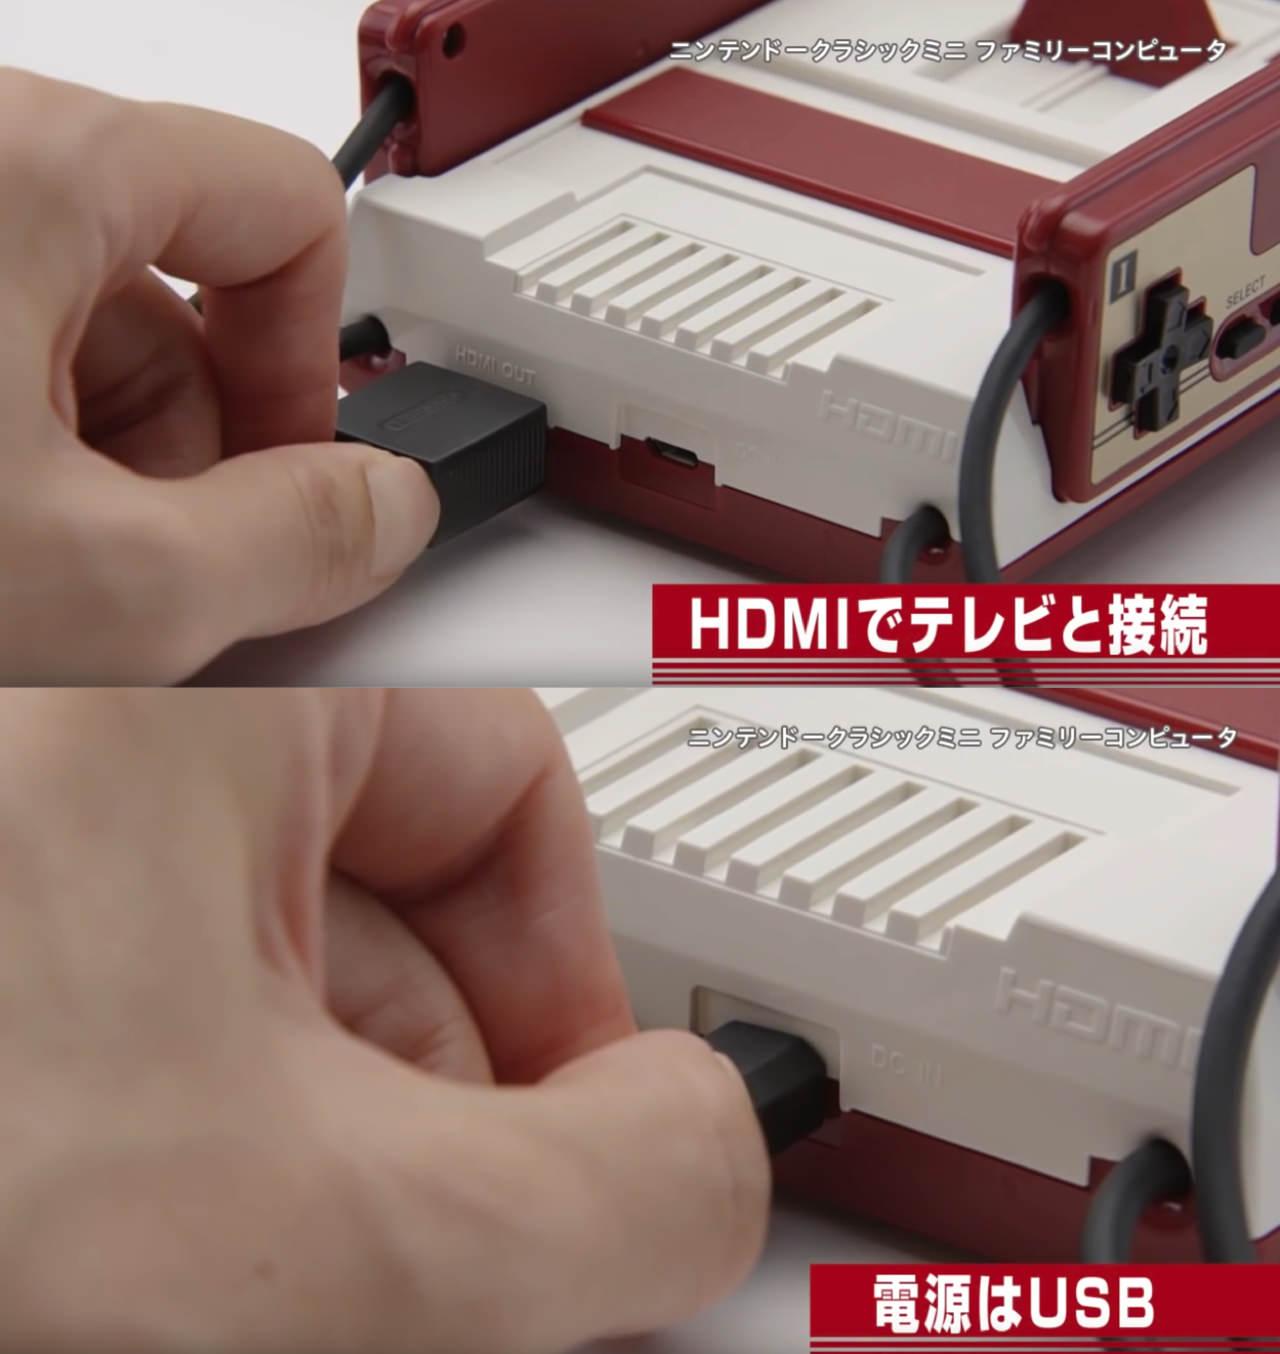 Nintendo classic mini family computer6